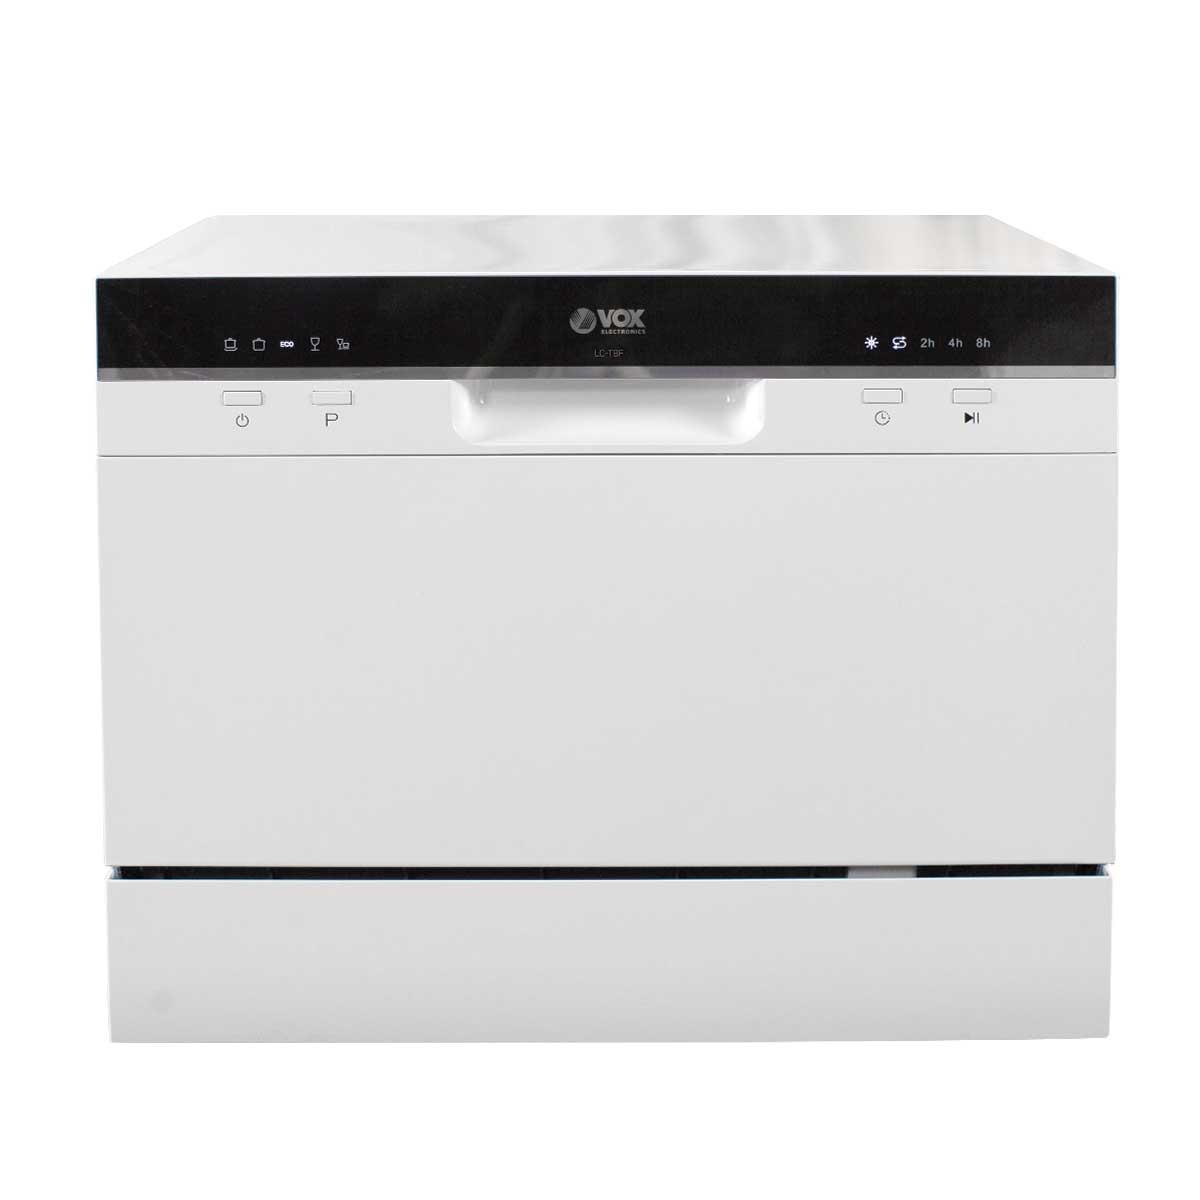 Dishwashers - Table top